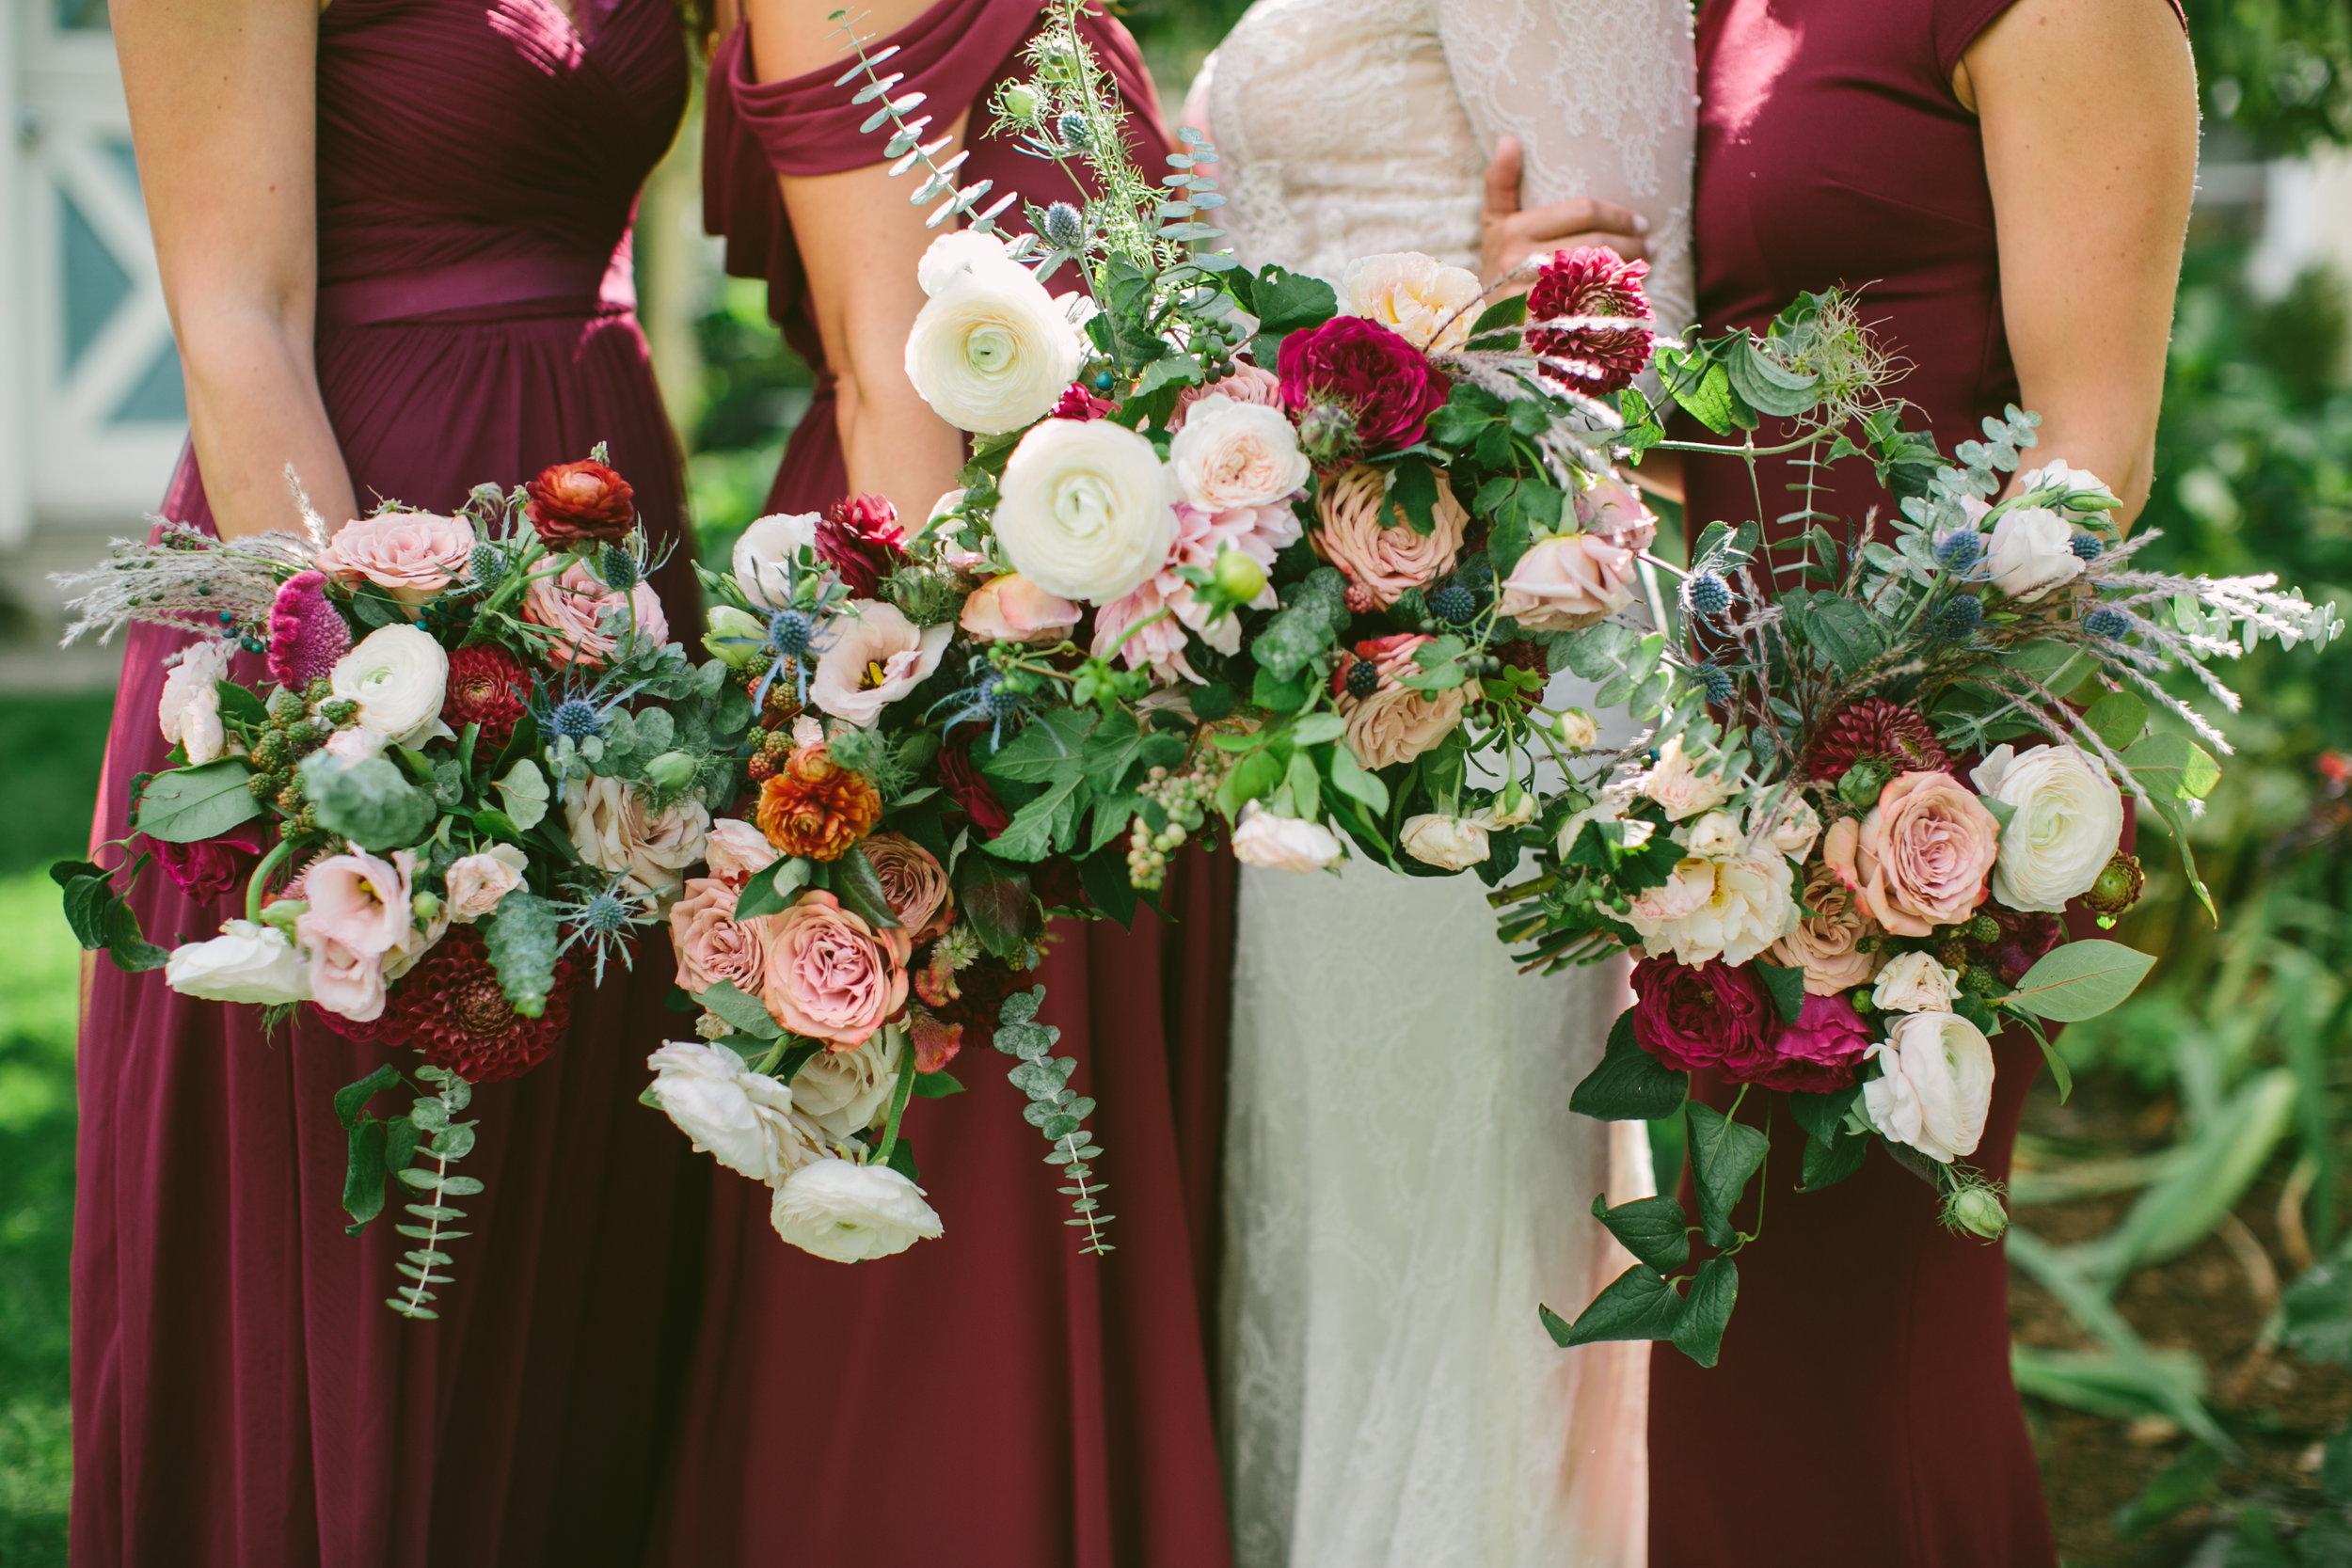 Bridalbliss.com | Portland Wedding | Oregon Event Planning and Design |  Yasmin K Photography